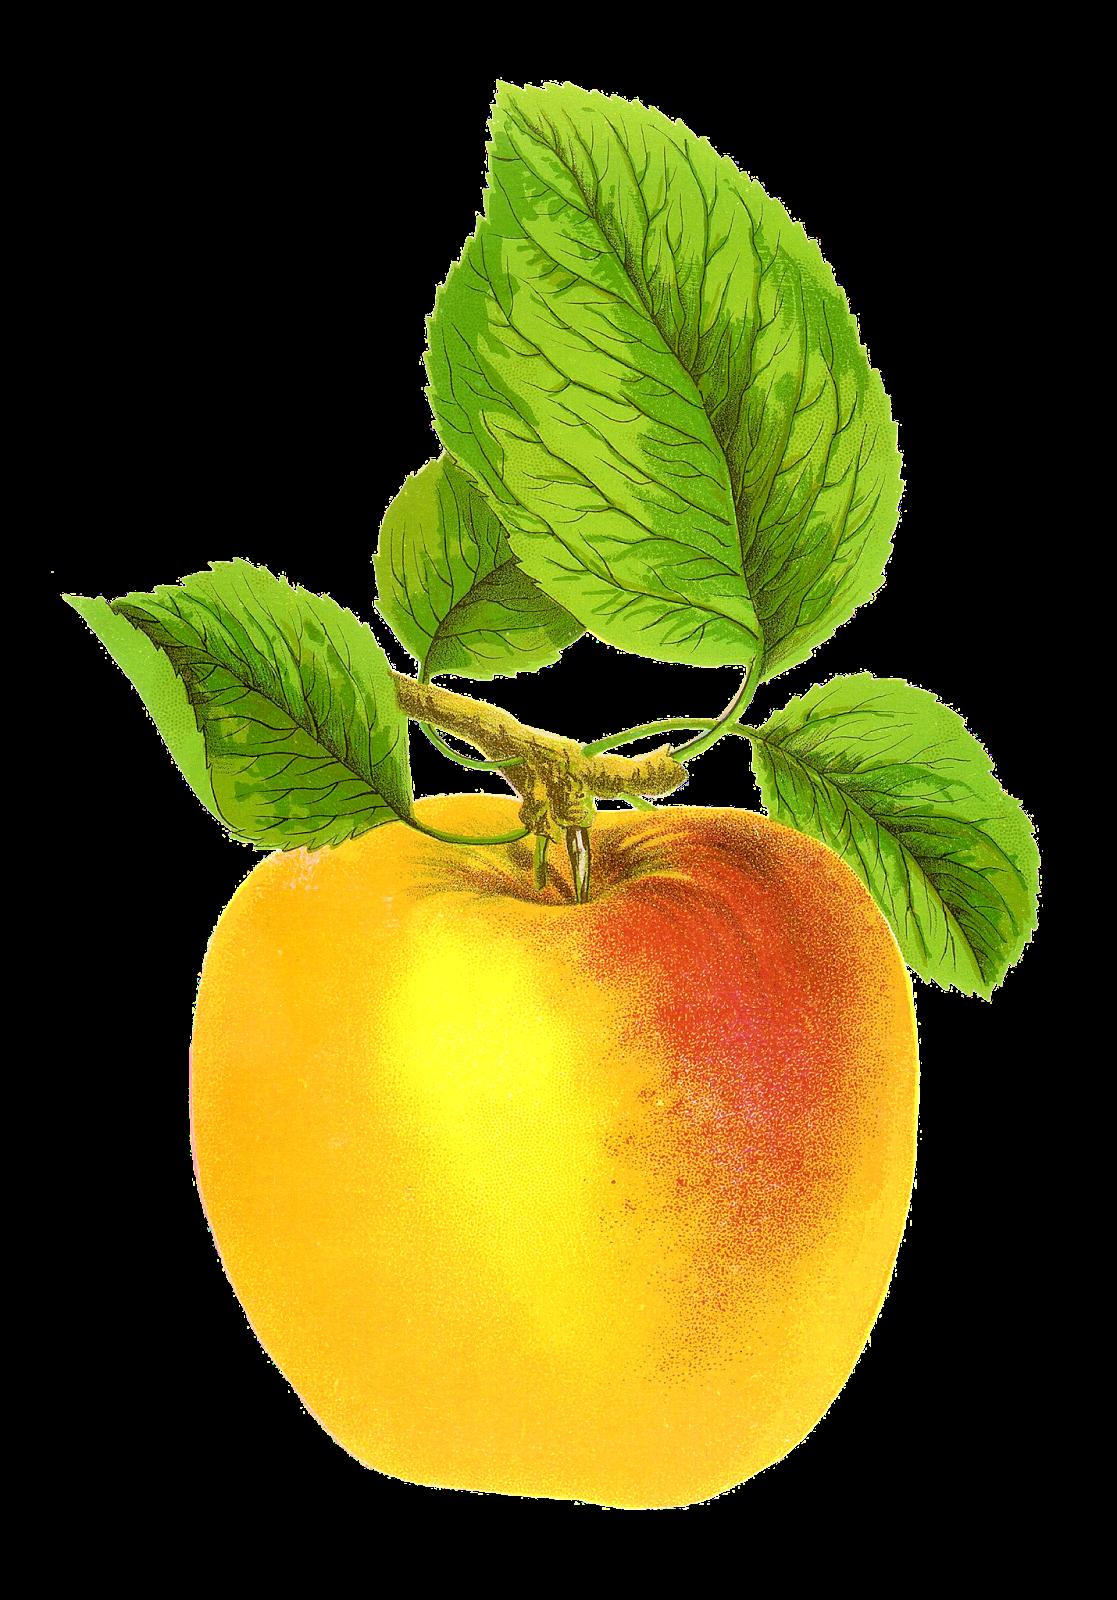 antique free digital fruit